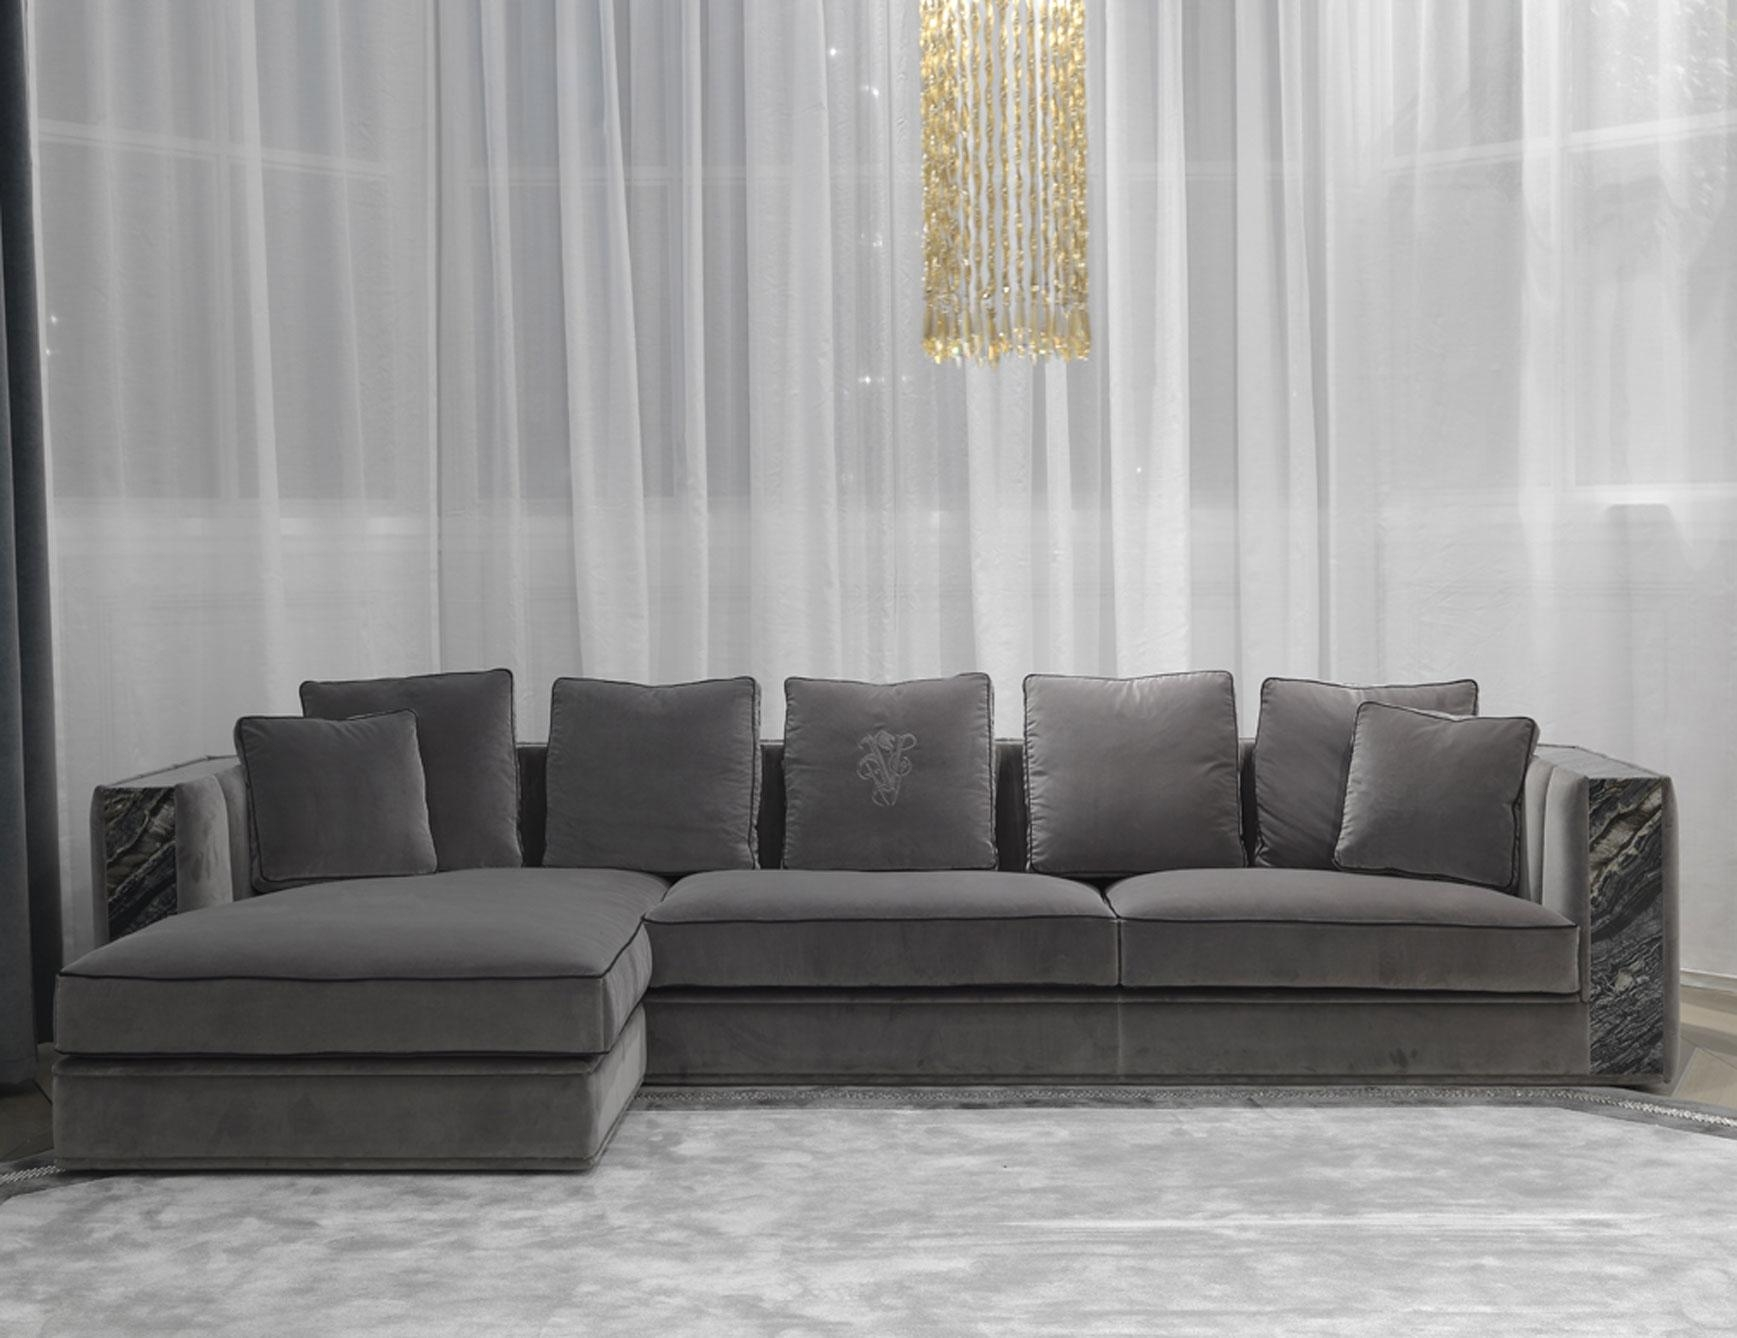 Nella Vetrina Visionnaire Ipe Cavalli Davis Grey Sofa In Regarding Davis Sofas (Image 16 of 20)